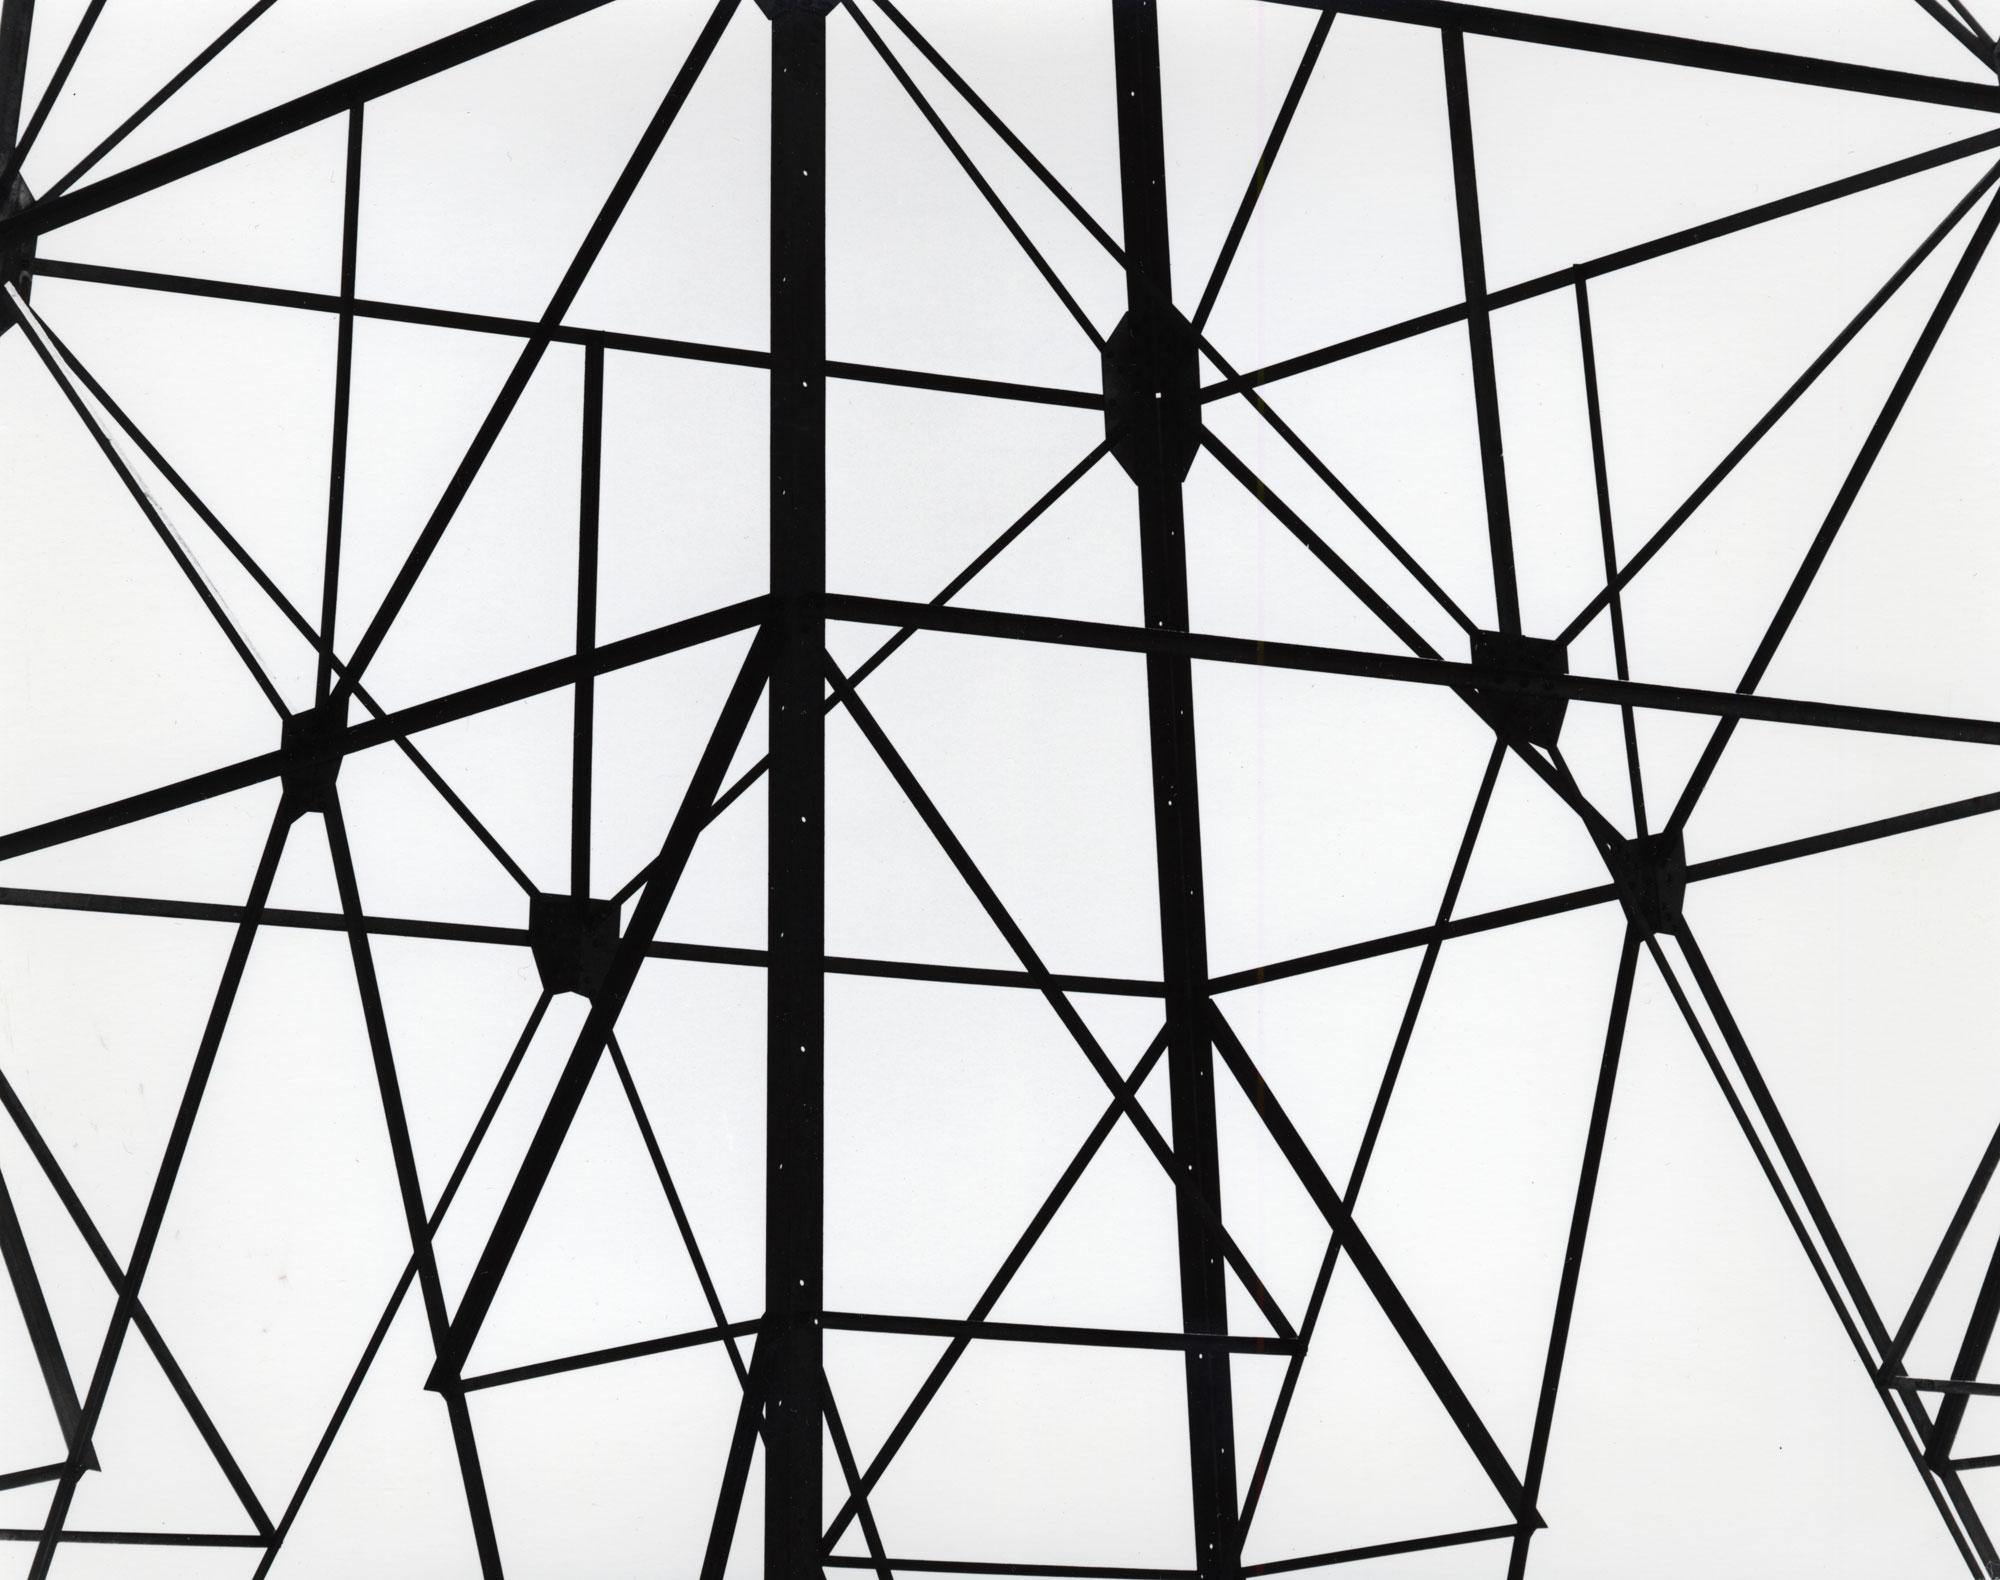 west coast photographic movement art blart Women Smoking Photography brett weston electrical towers metal c 1975